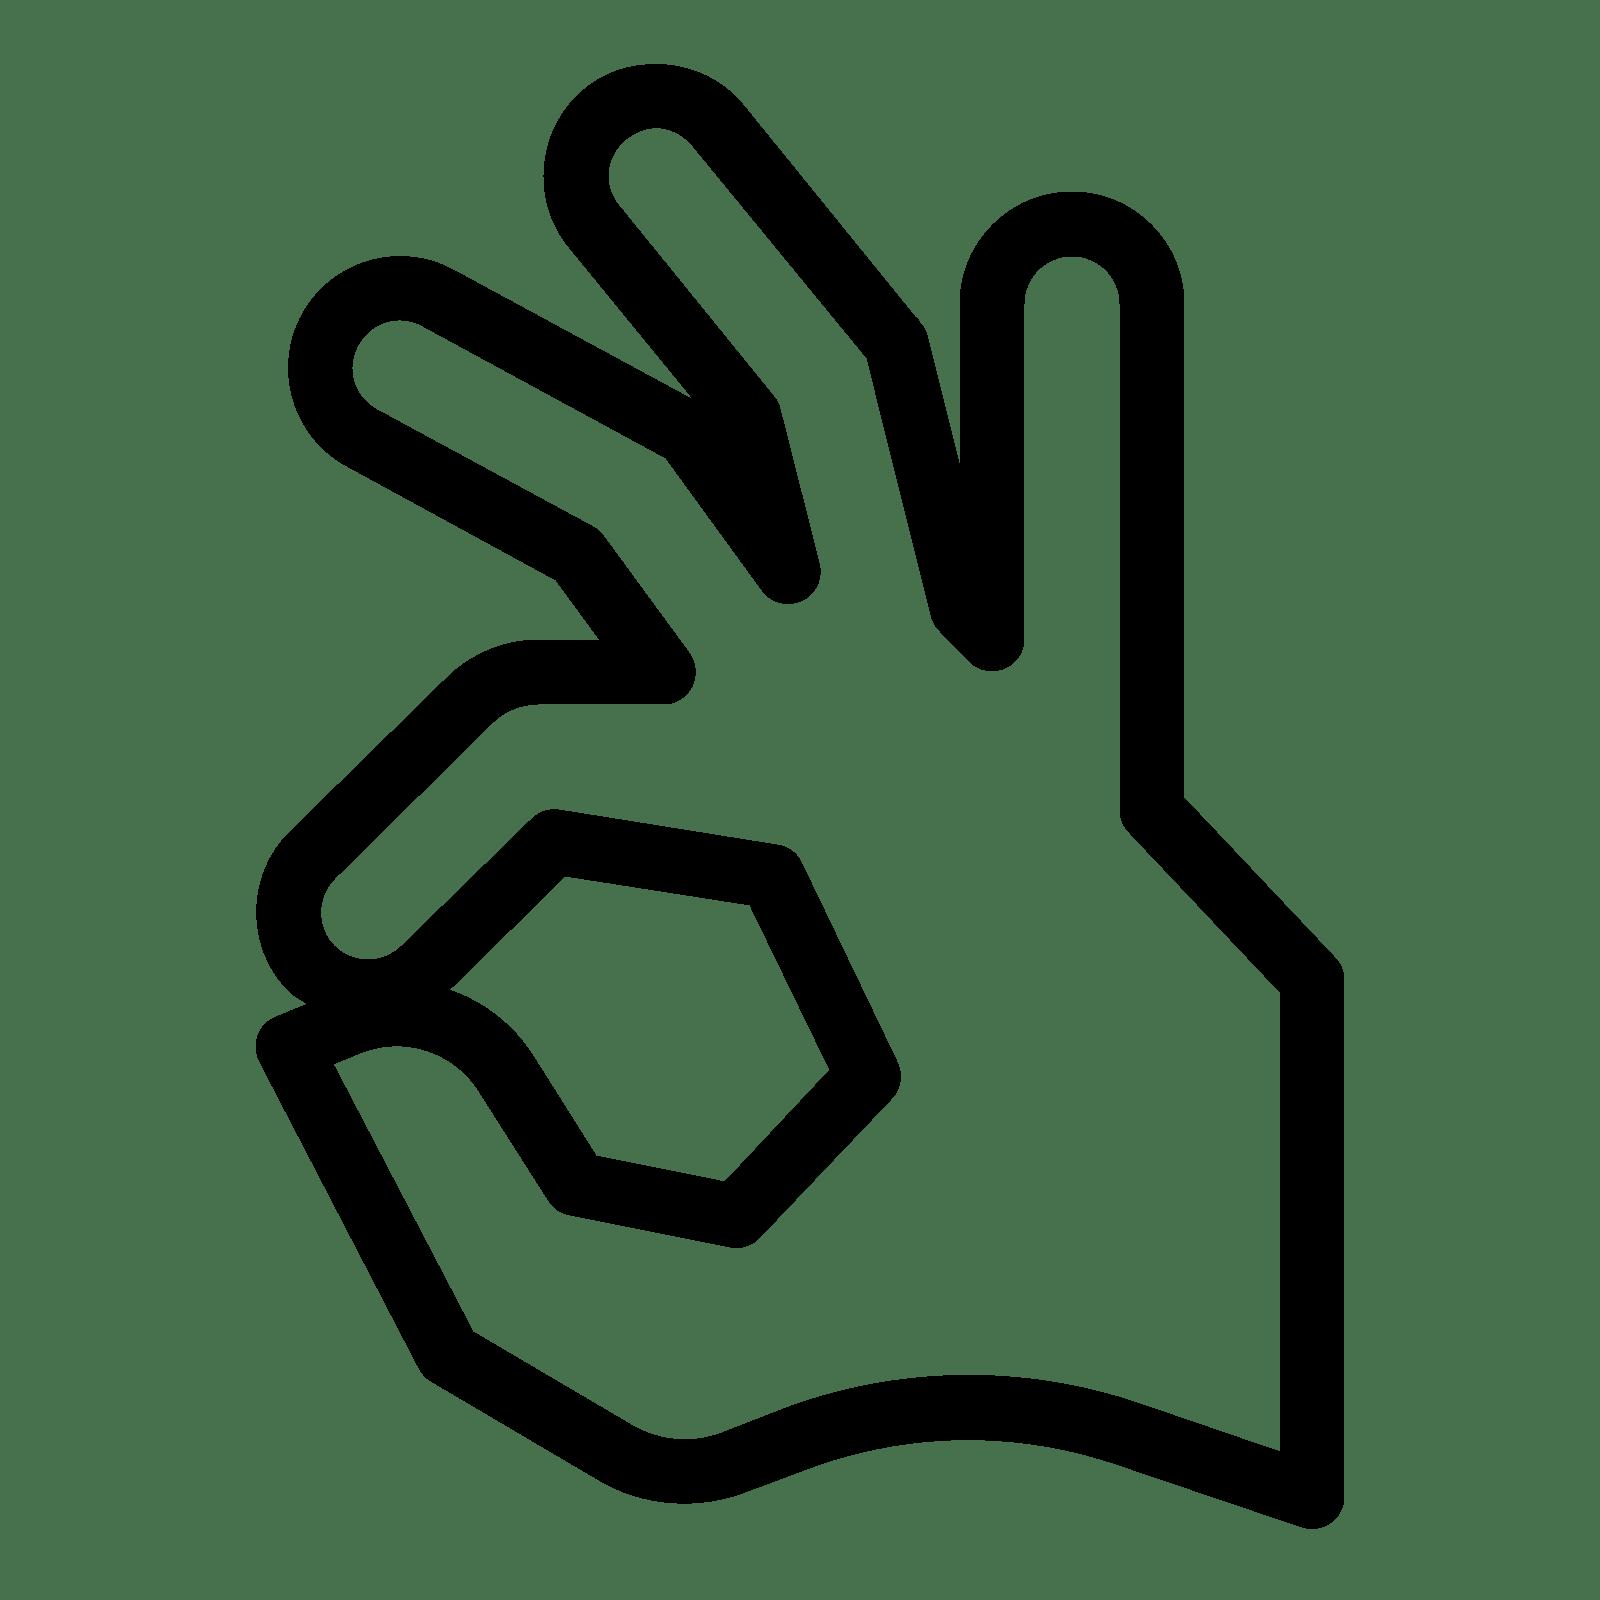 Up Symbol